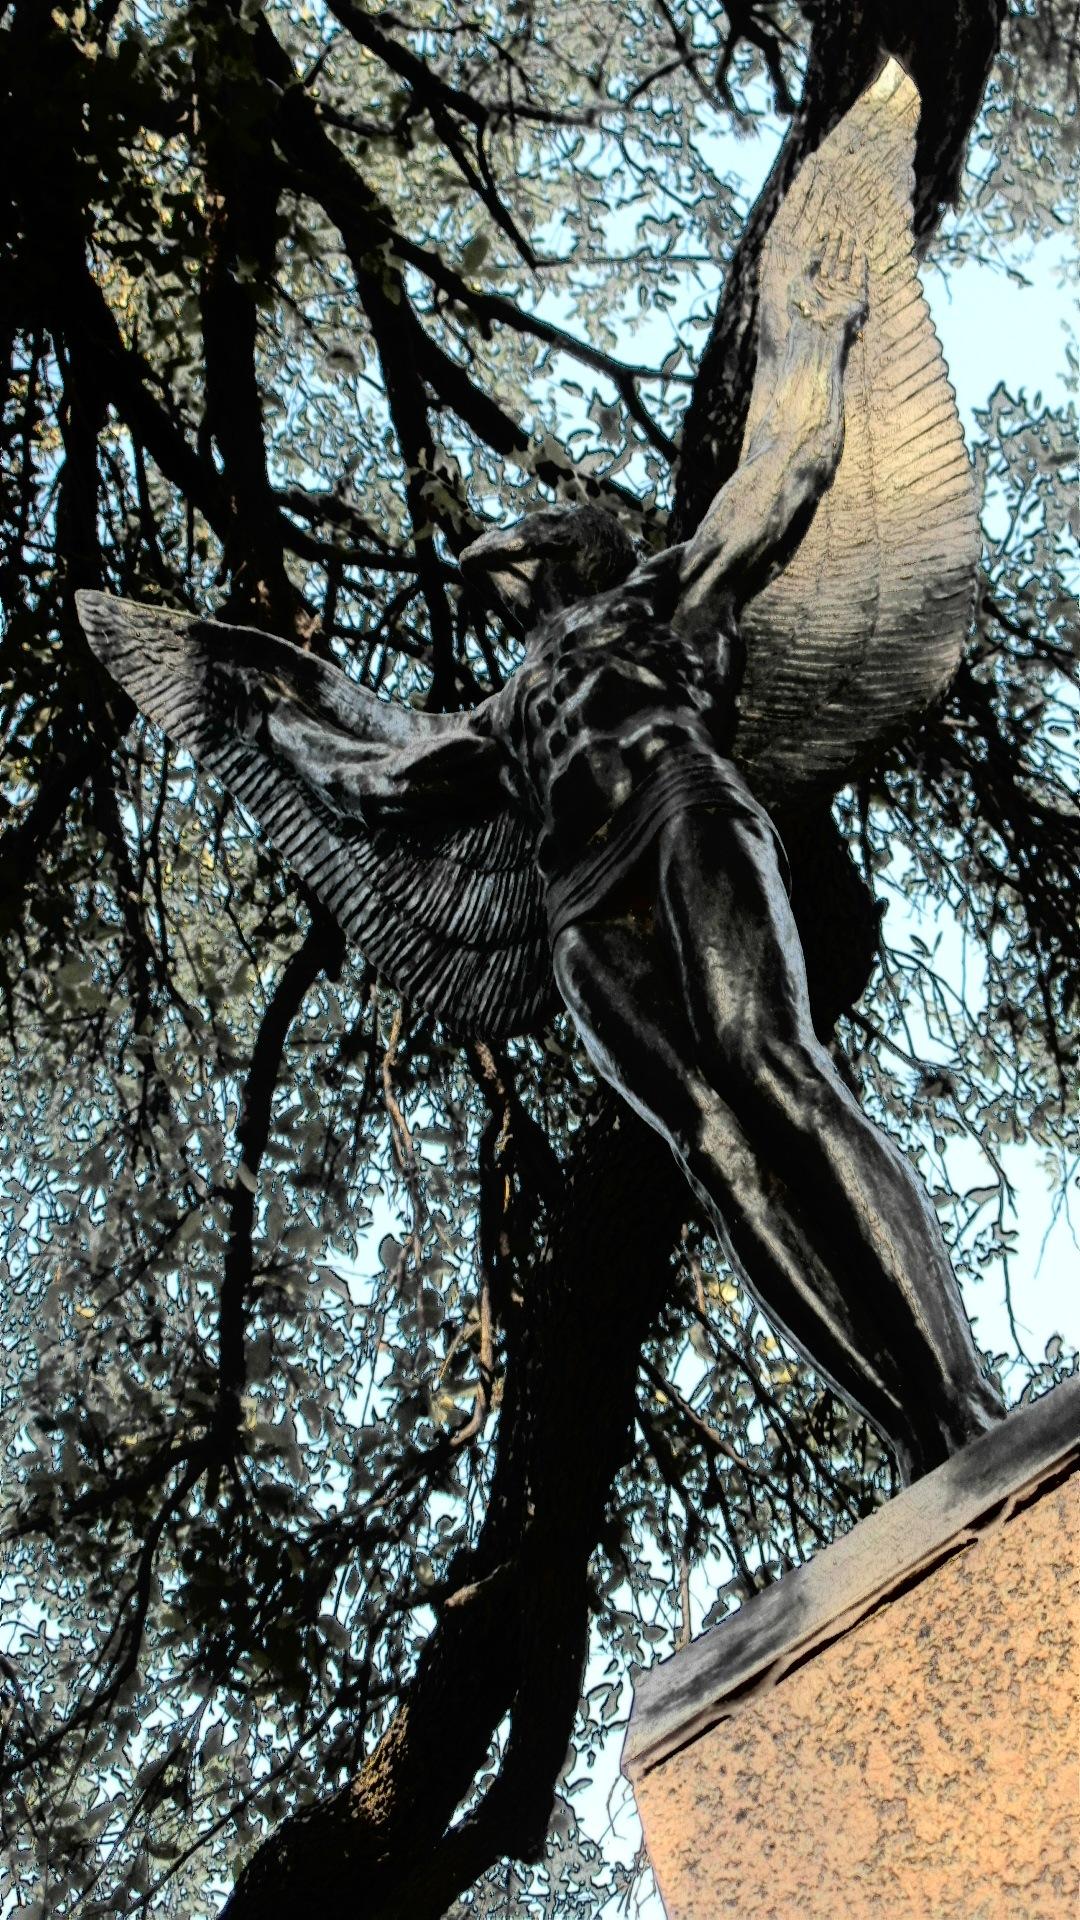 bLack aNgeL . . . take flight  by keith sharp